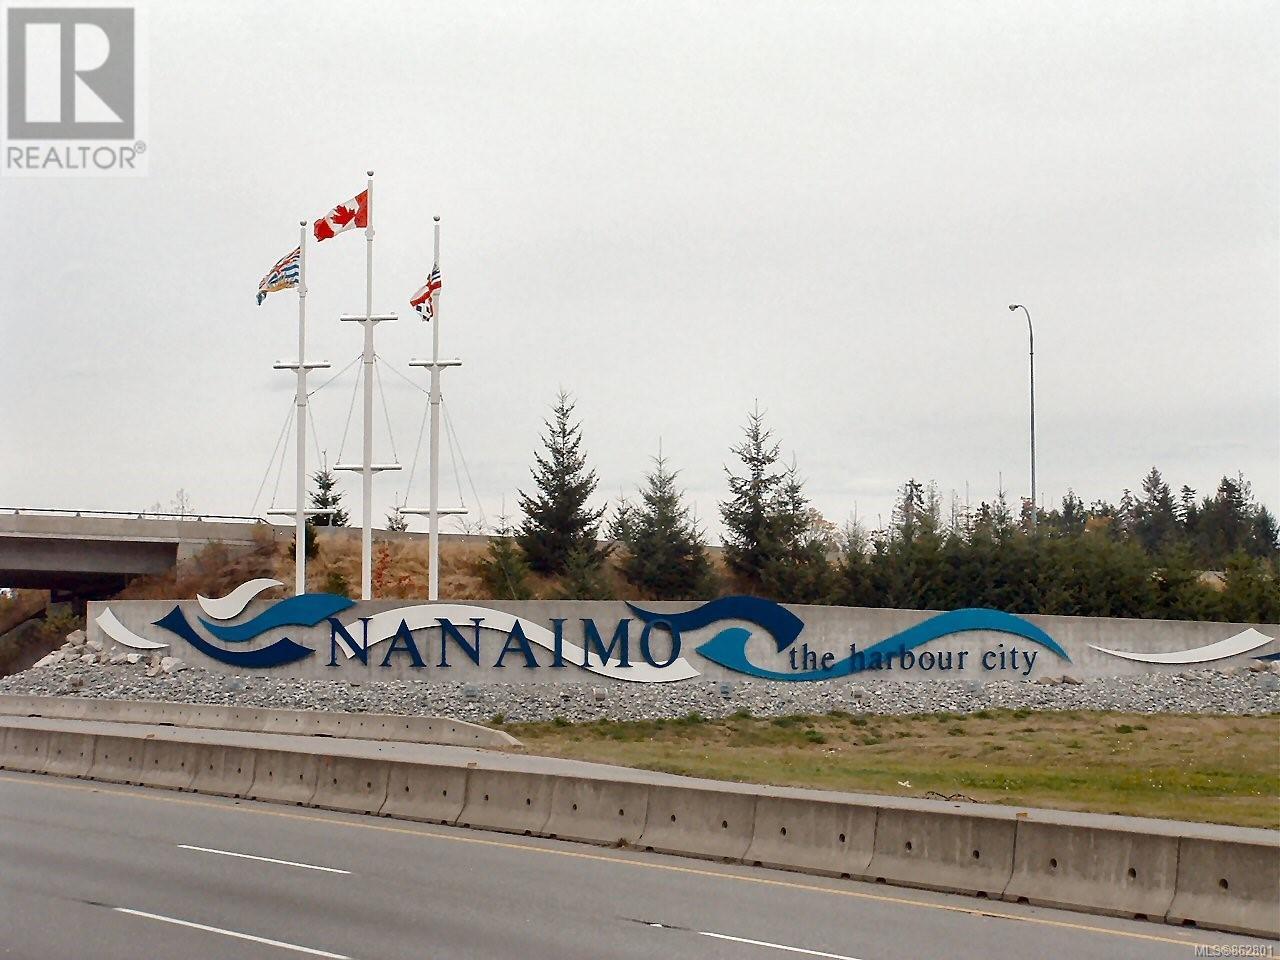 203 150 Promenade Dr, Nanaimo, British Columbia  V9R 6M6 - Photo 30 - 862801